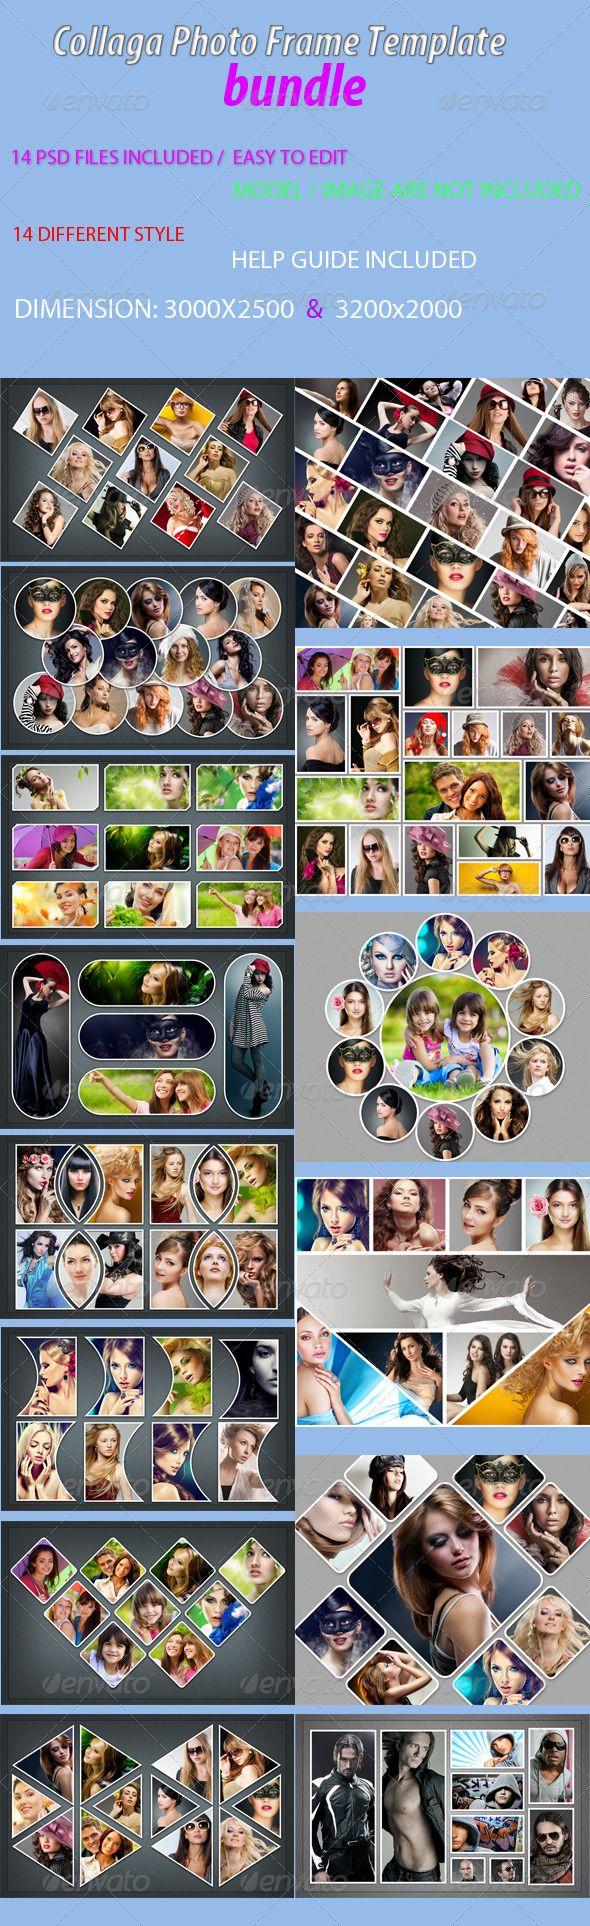 Collaga Photo Frame Template bundle #design Download: http://graphicriver.net/item/-collaga-photo-frame-template-bundle/7091599?ref=ksioks